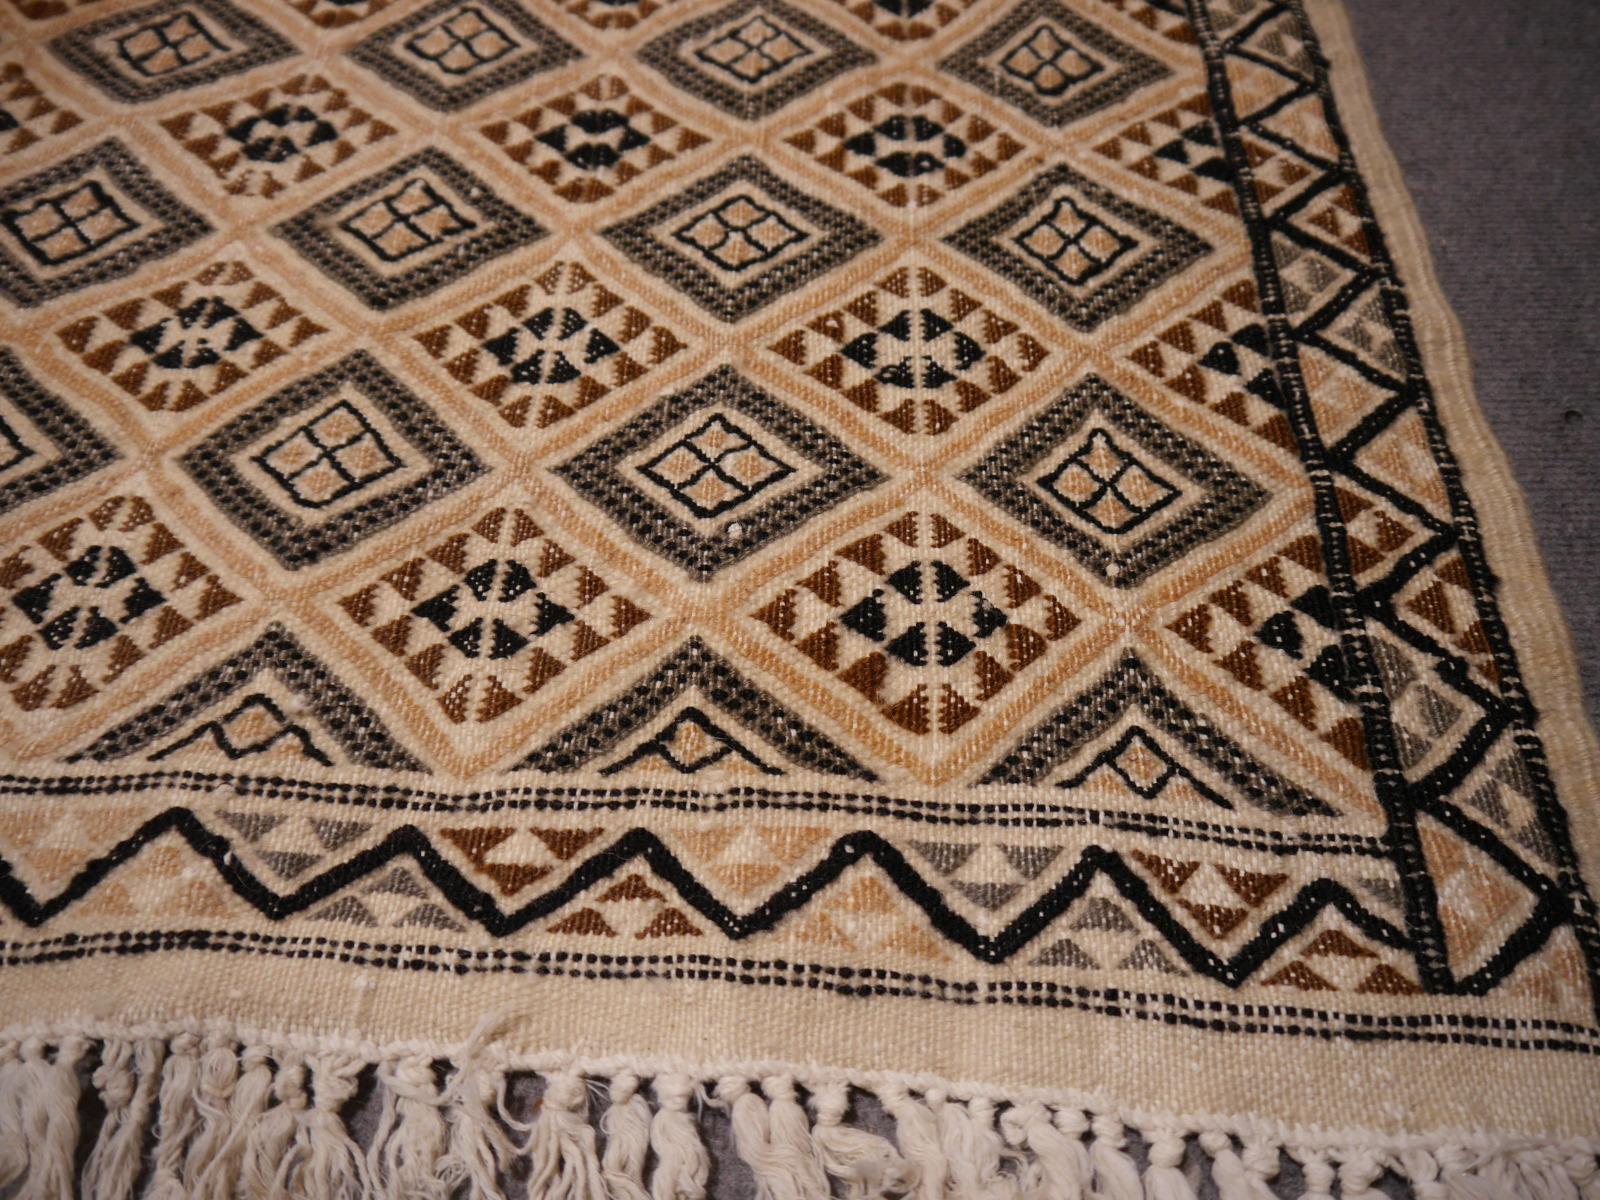 14806 berber kelim teppich 240 x 162 cm beige grau. Black Bedroom Furniture Sets. Home Design Ideas